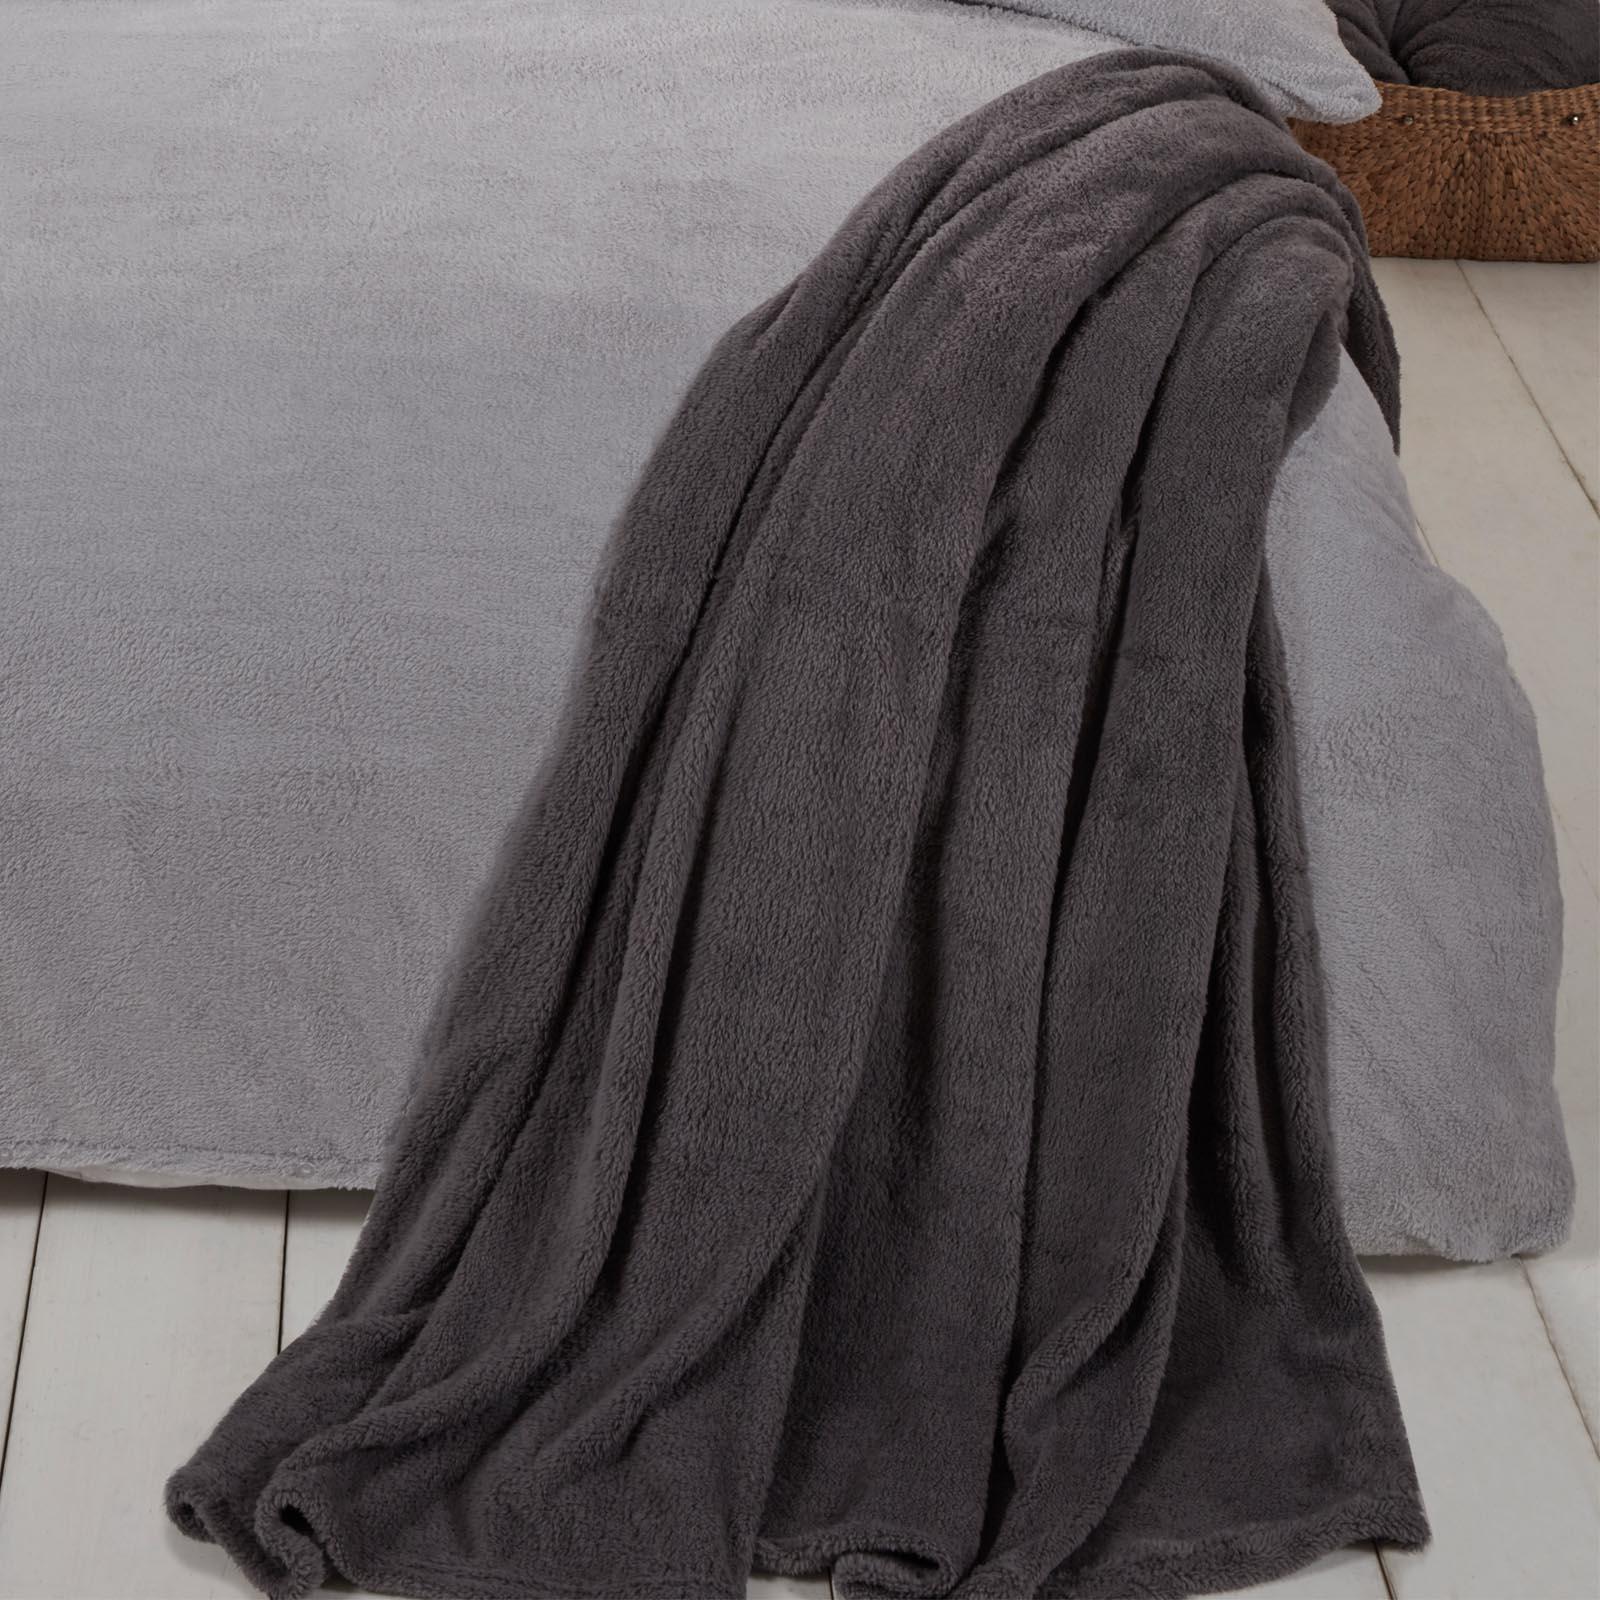 Brentfords-Teddy-Fleece-Bear-Blanket-Large-Throw-Over-Bed-Plush-Soft-Bedspread thumbnail 10